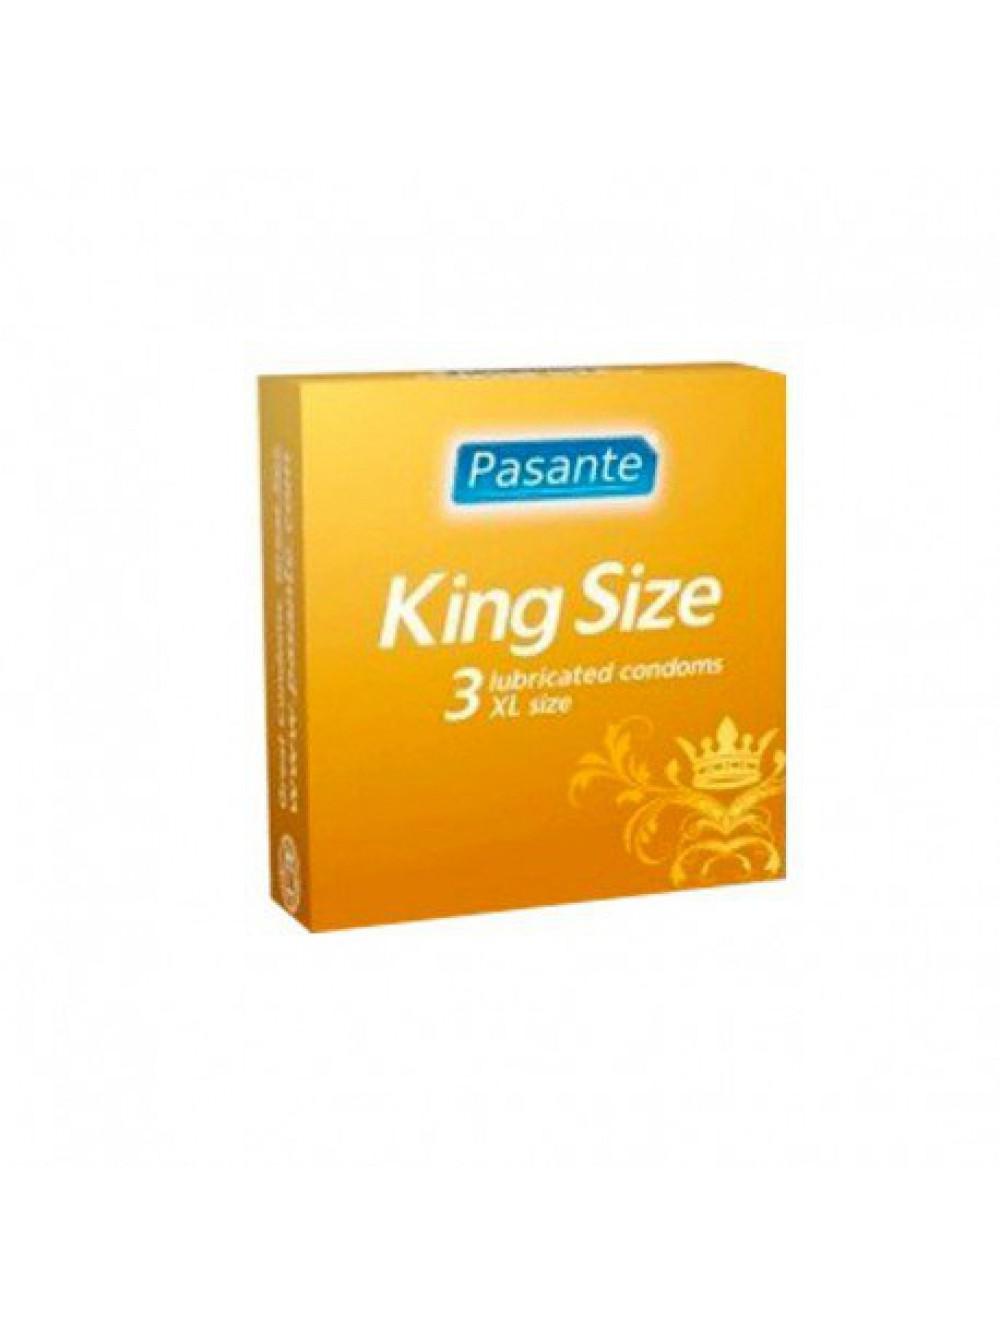 King Size 3 p.